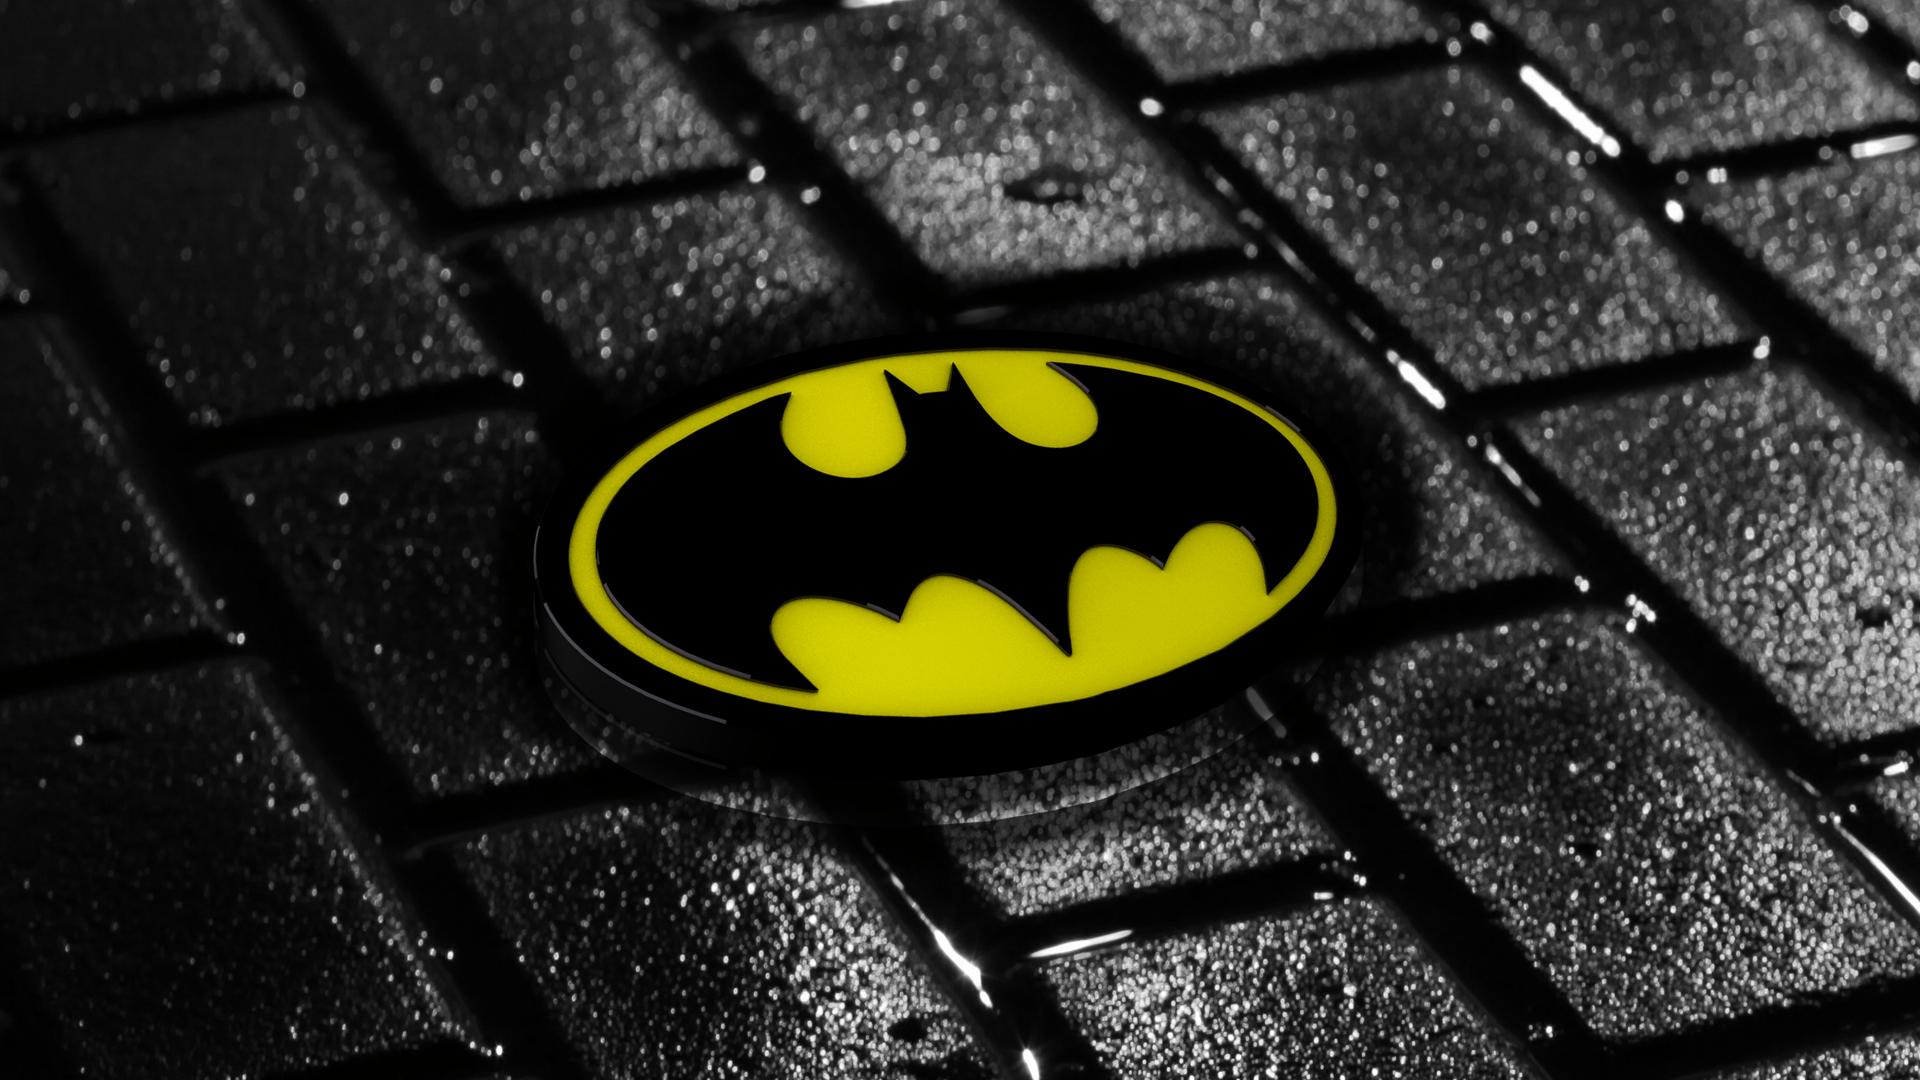 Batman Logos Wallpapers - Wallpaper Cave